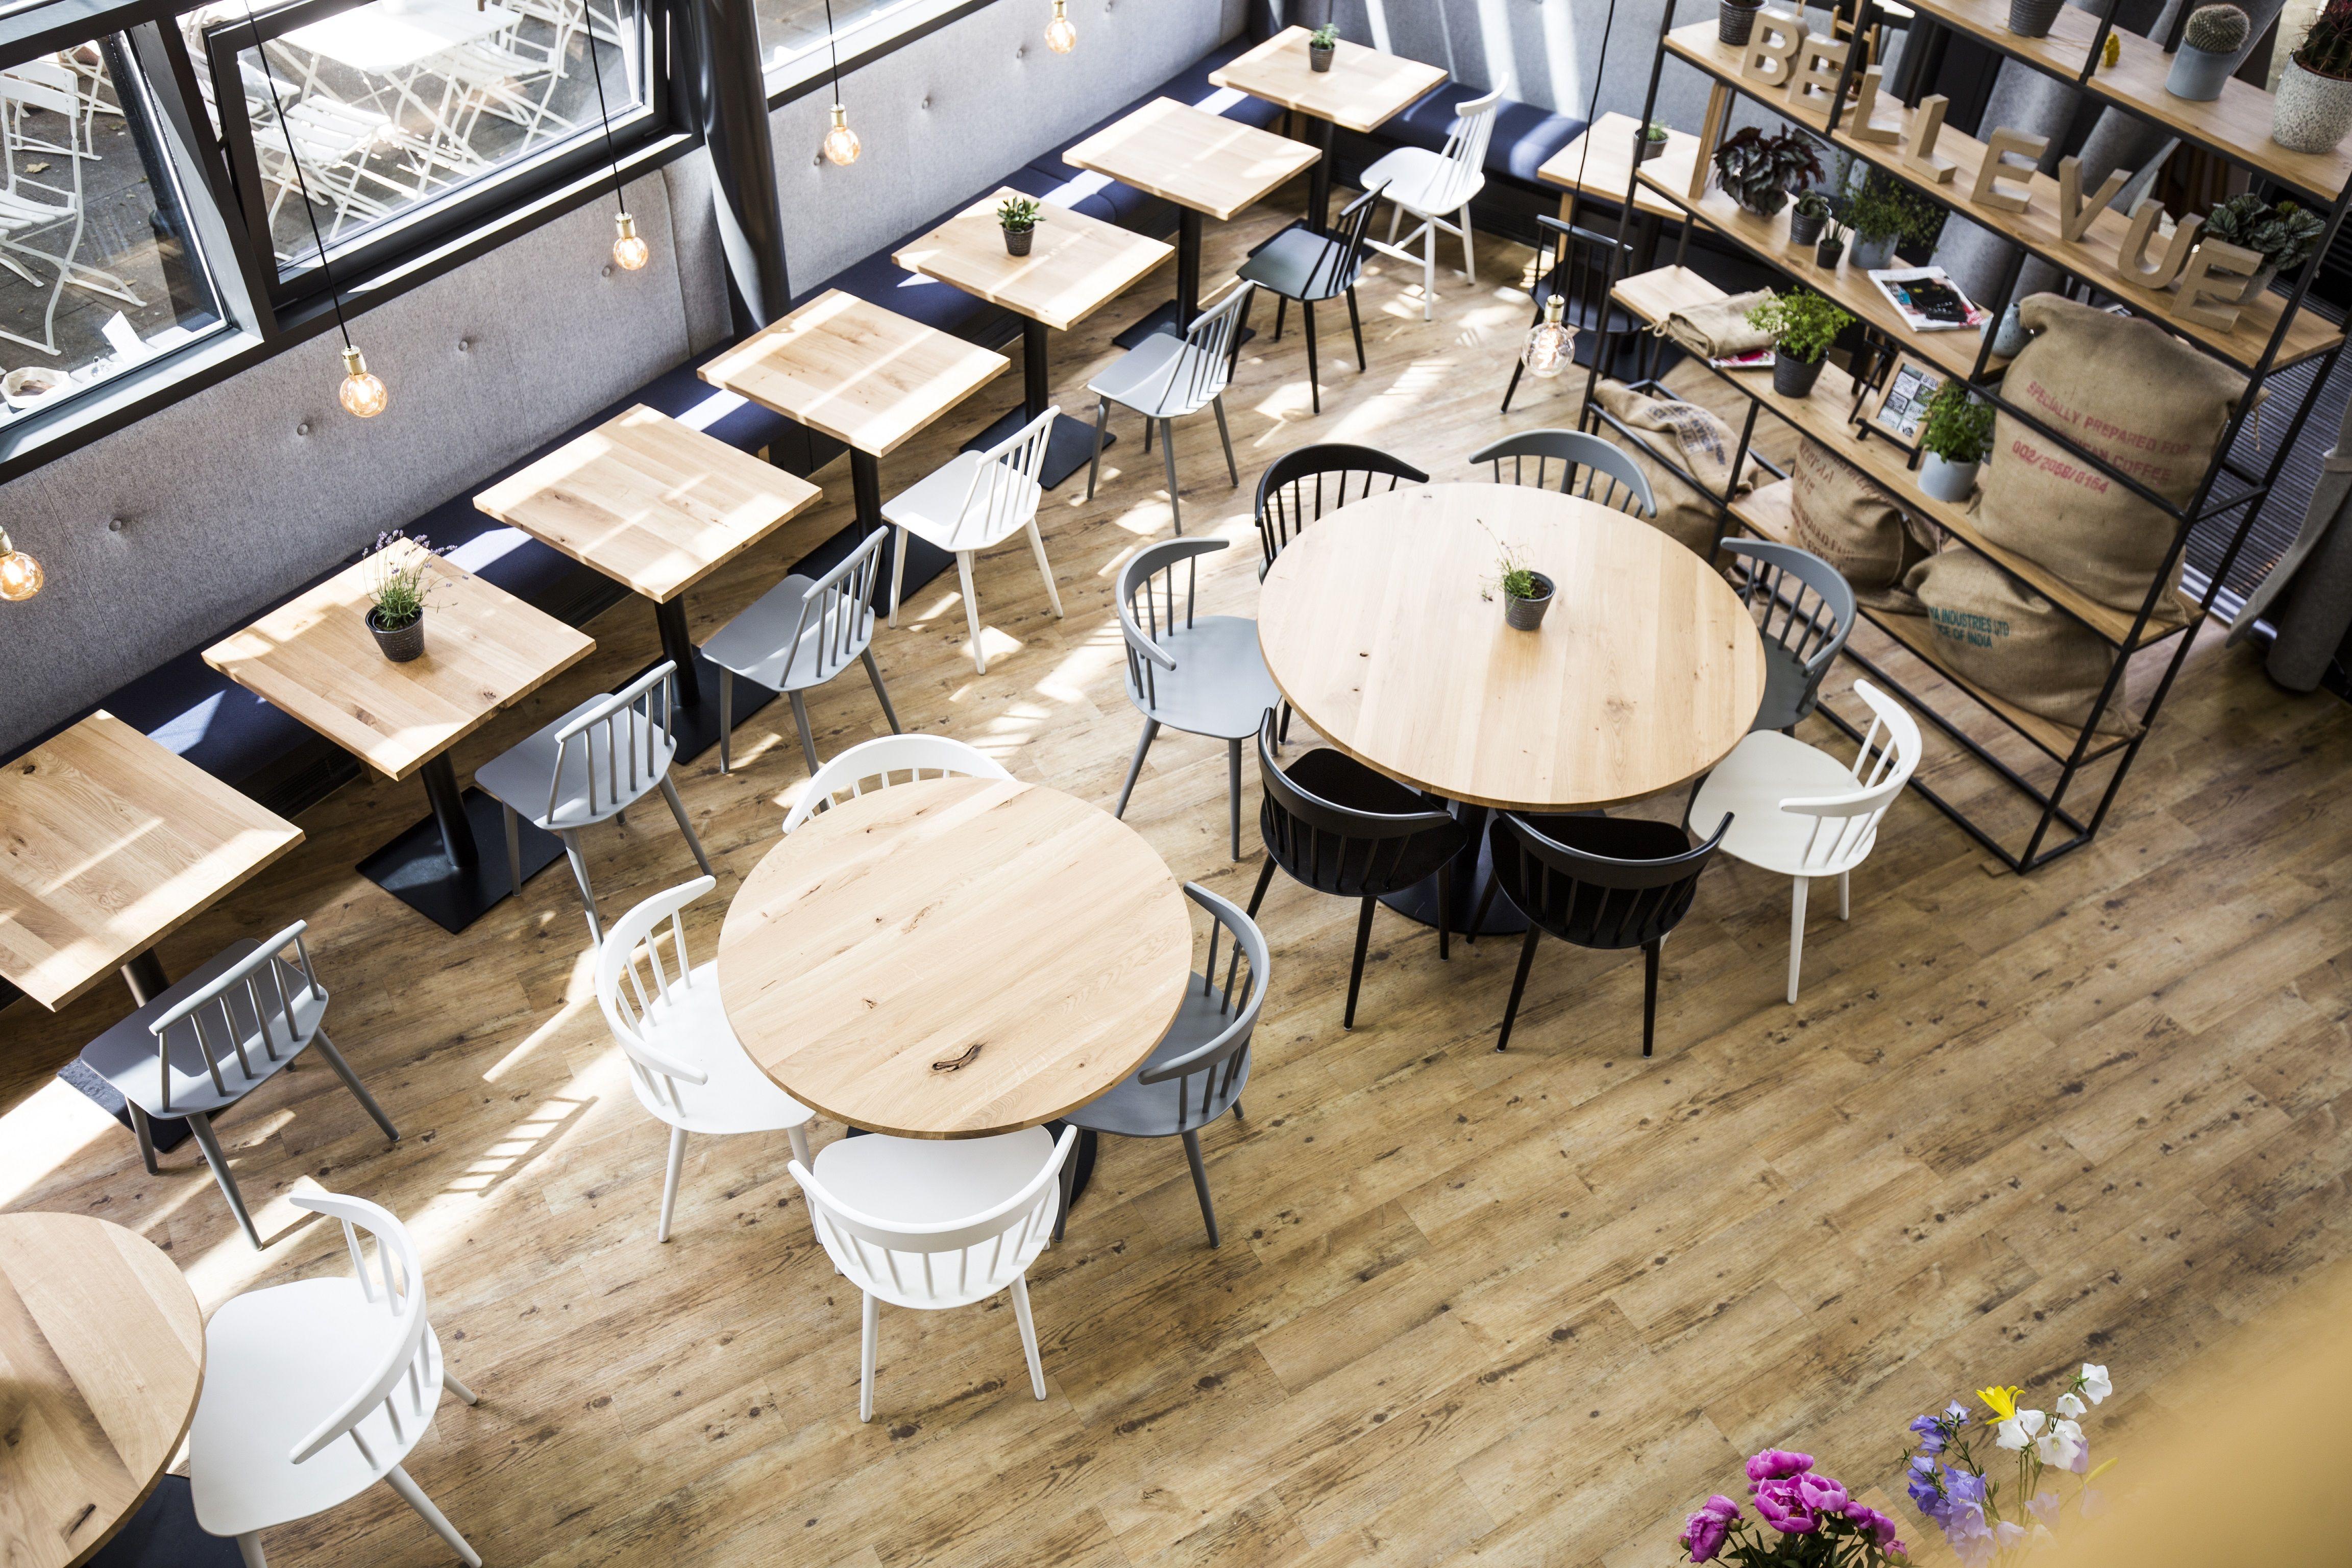 Bellevue   Café   Restaurant   Bar   Interior Design   Studio Yaya   Jacob  Mayer